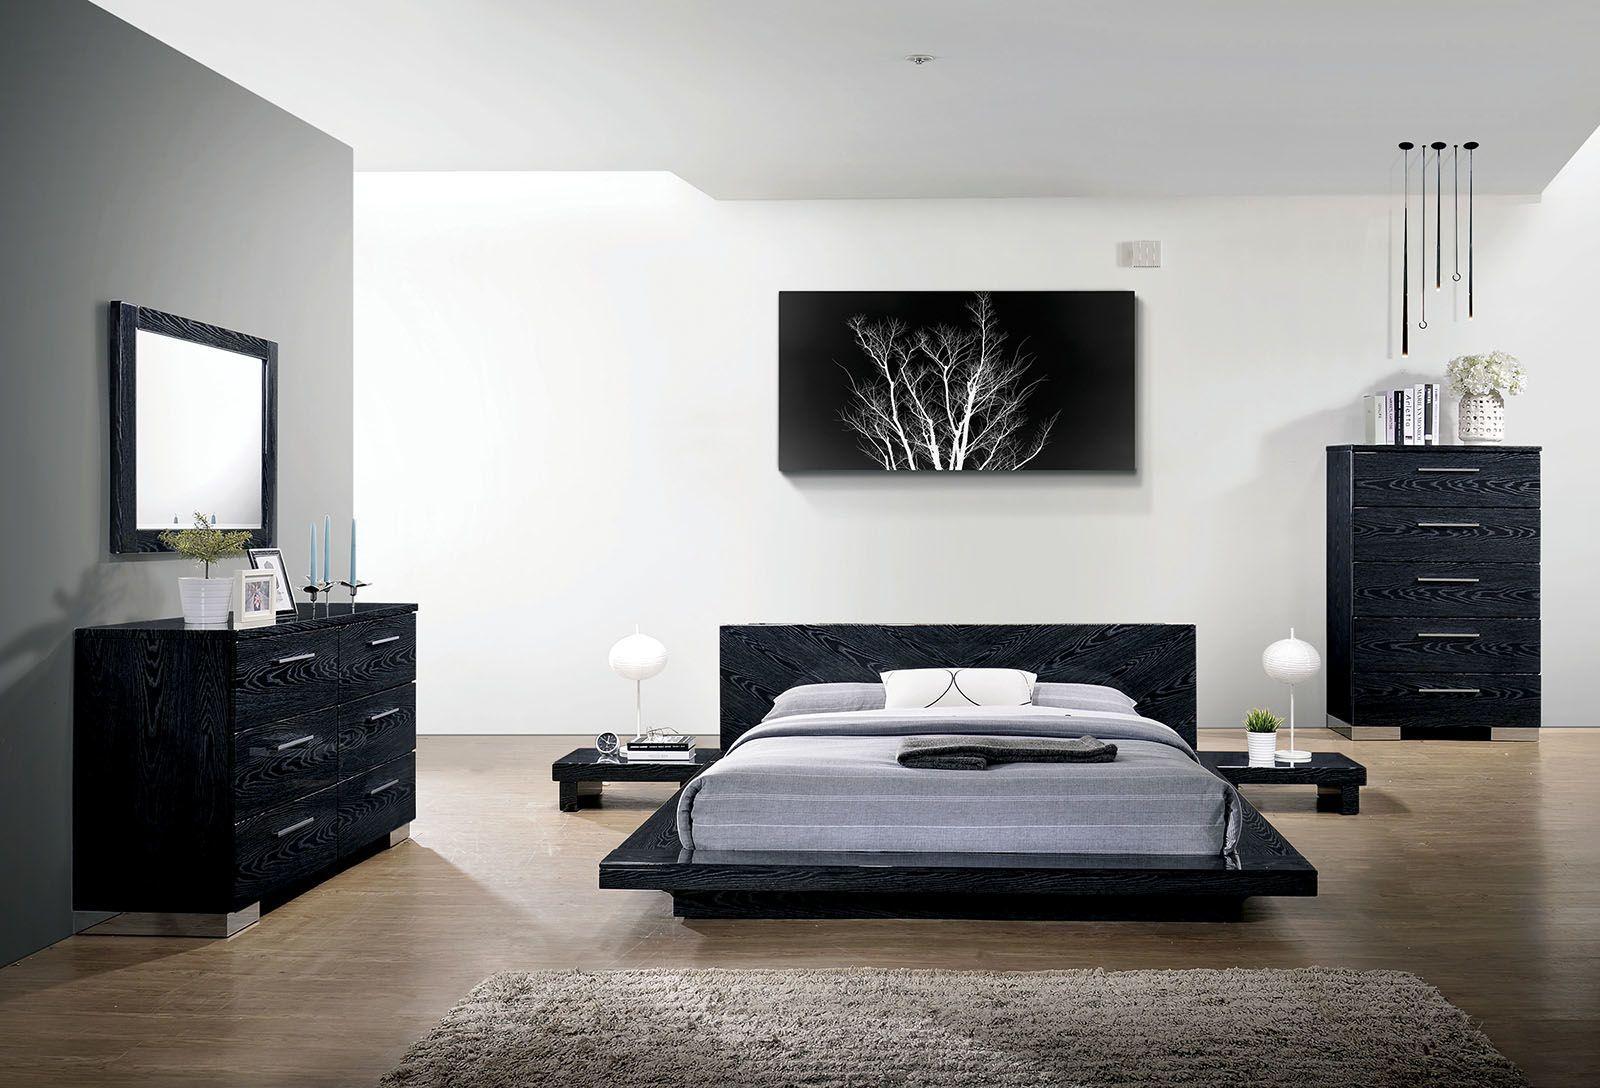 Cristie Black King Size Bed Modern Bedroom Furniture Platform Bedroom Sets Black Bedroom Sets